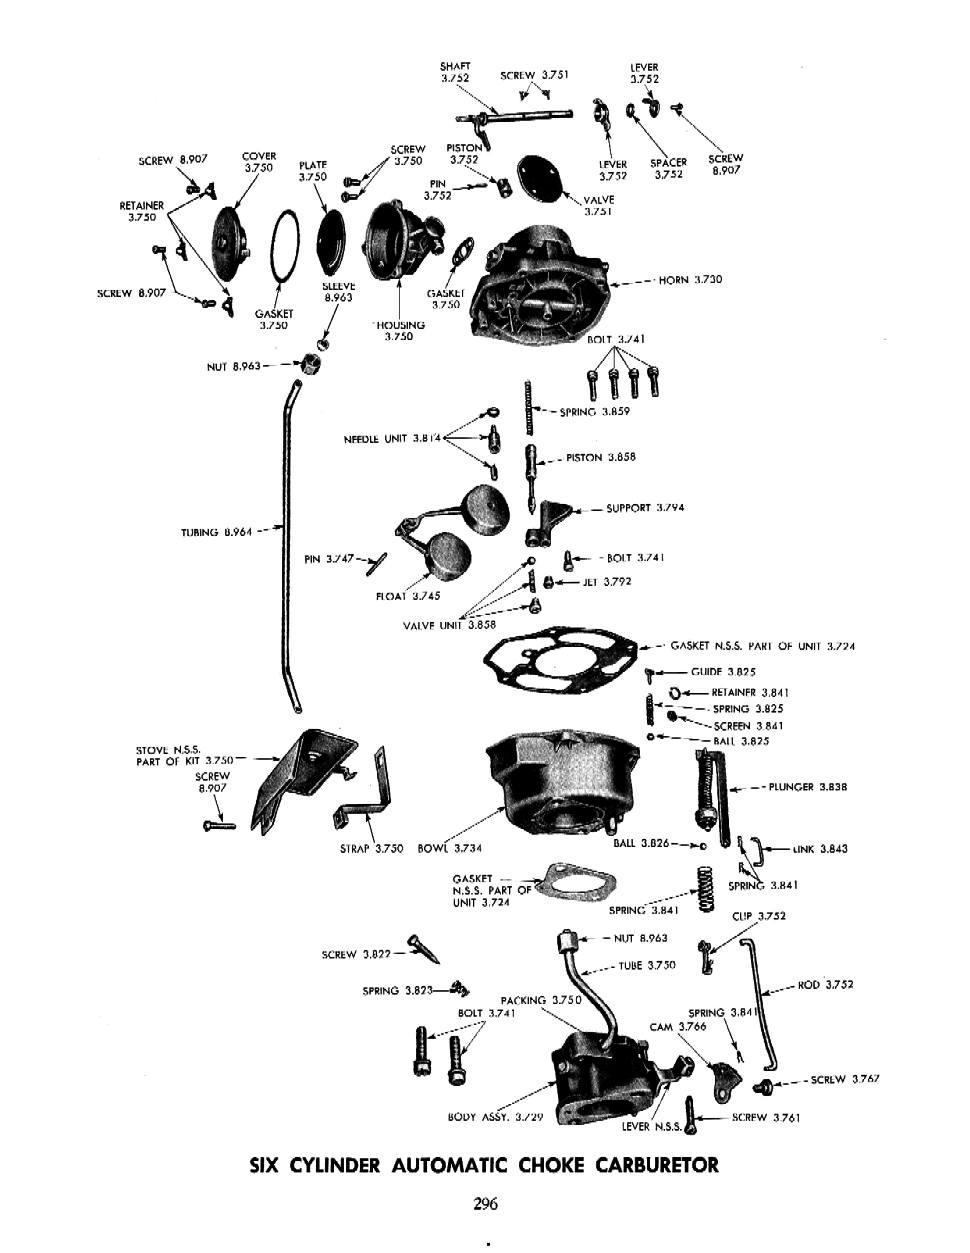 chevrolet caprice parts catalog